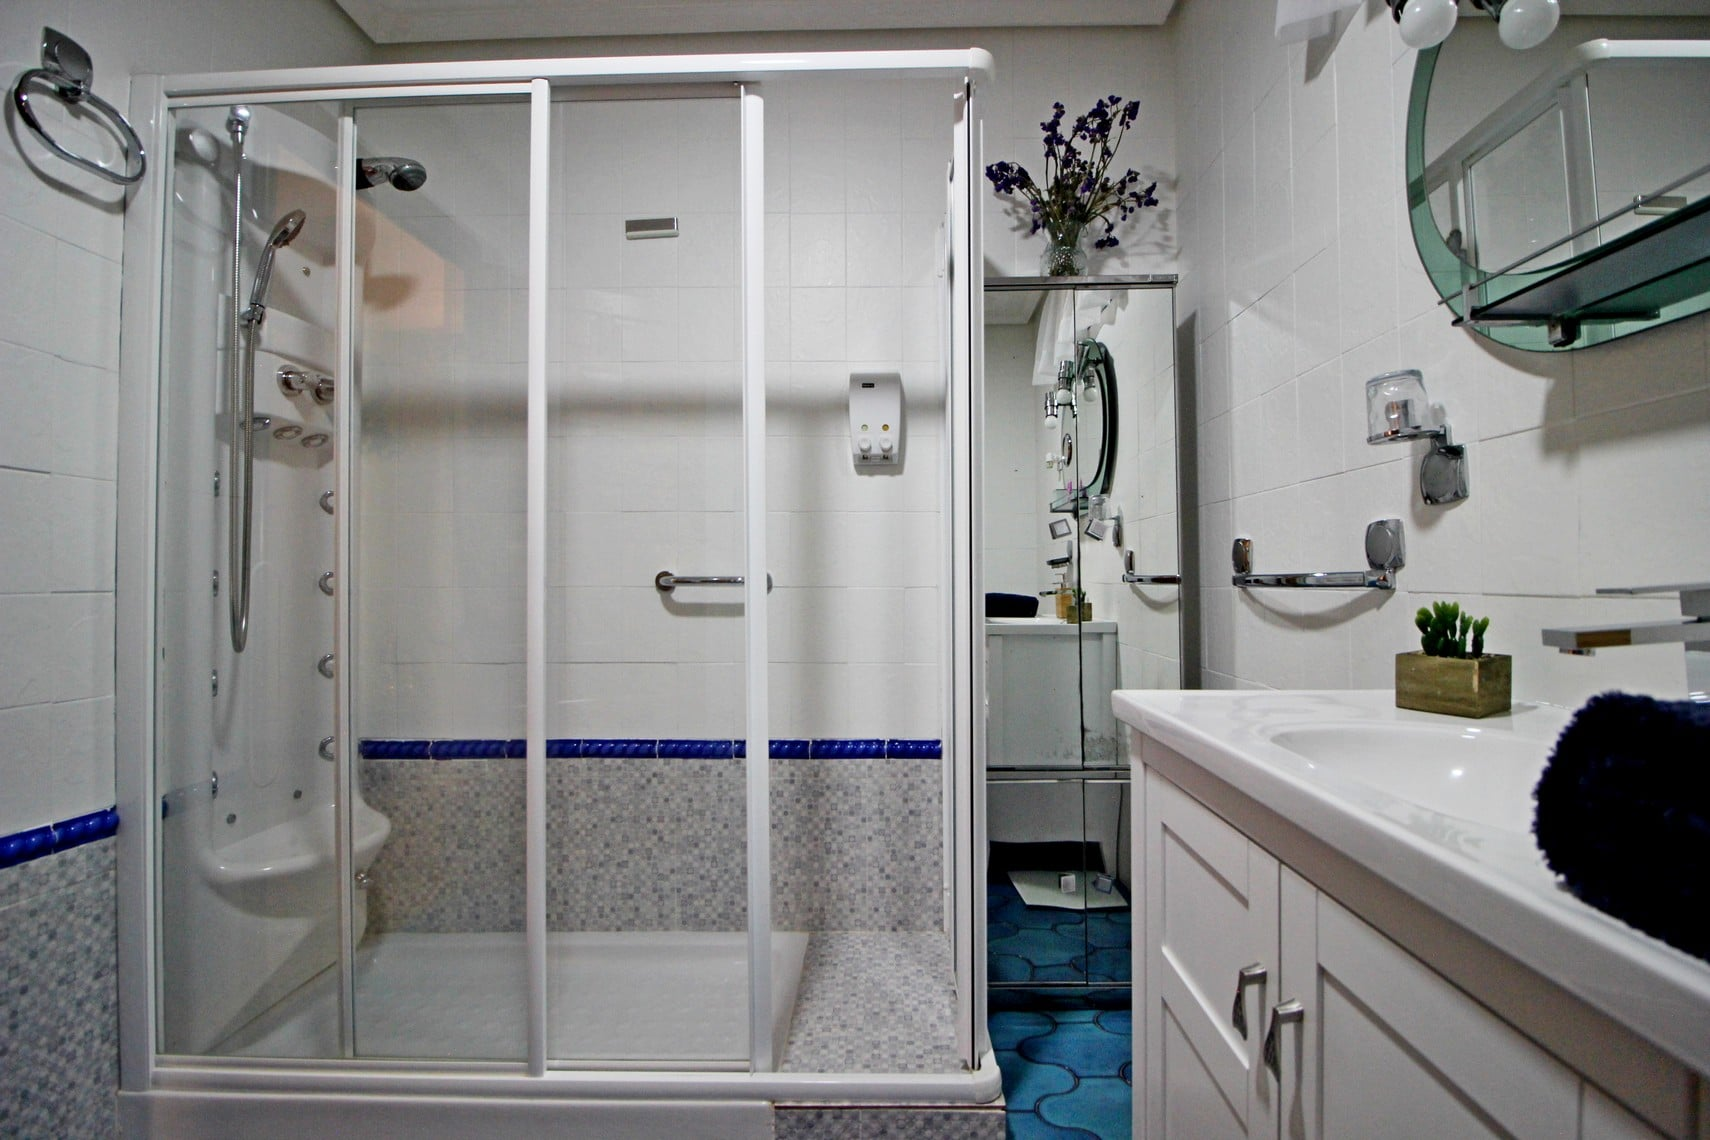 baño_las_hazas_jarandilla0005